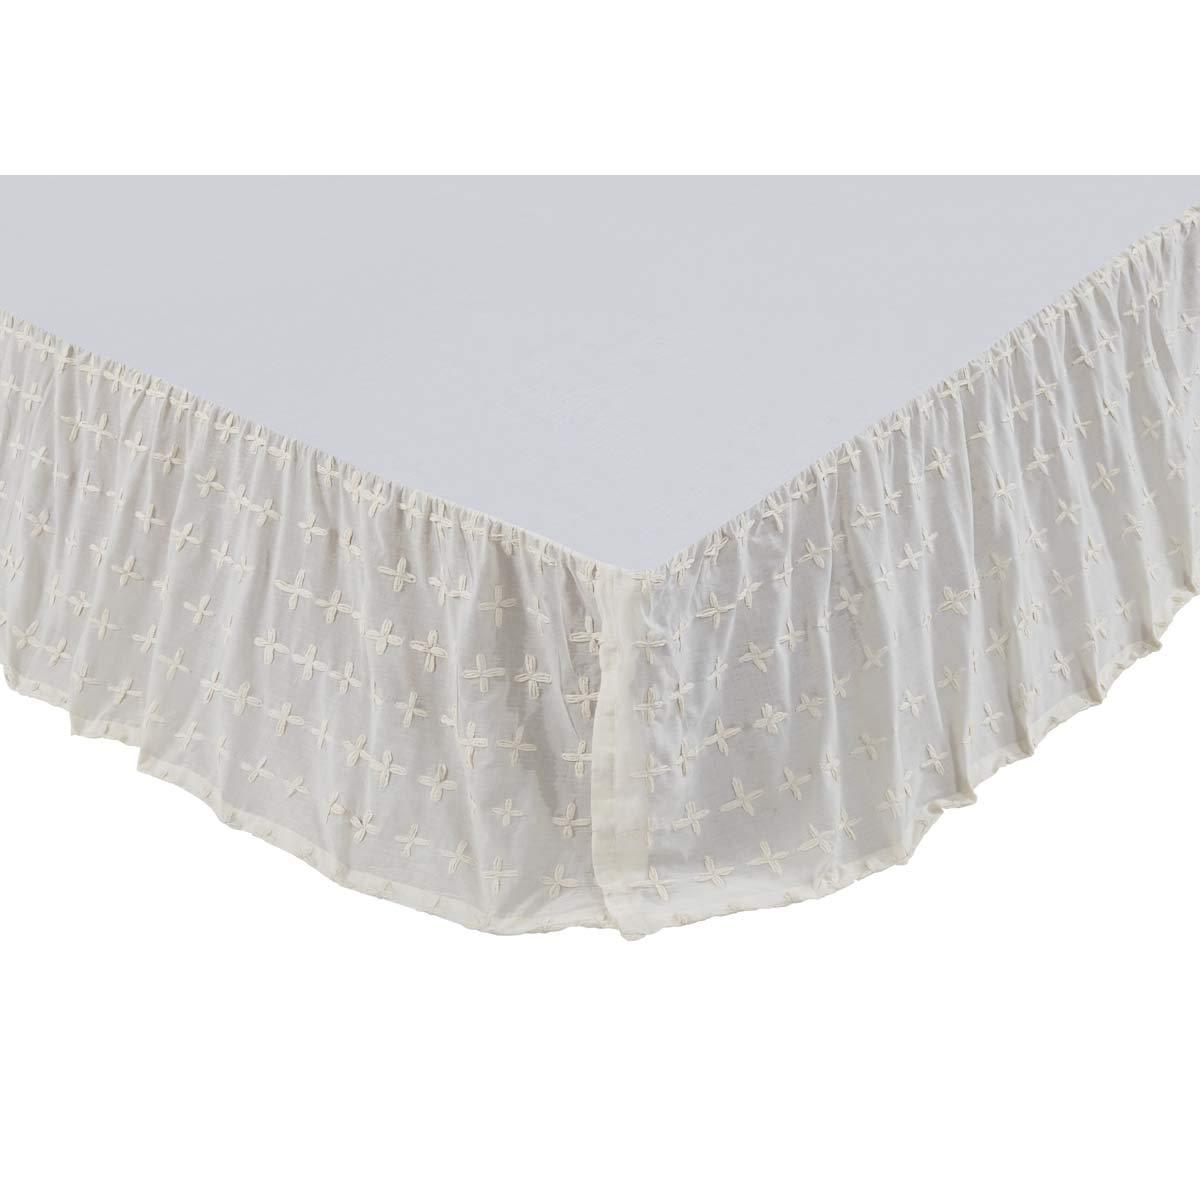 VHC Brands Farmhouse Bedding Willow Bed Skirt White King 29435